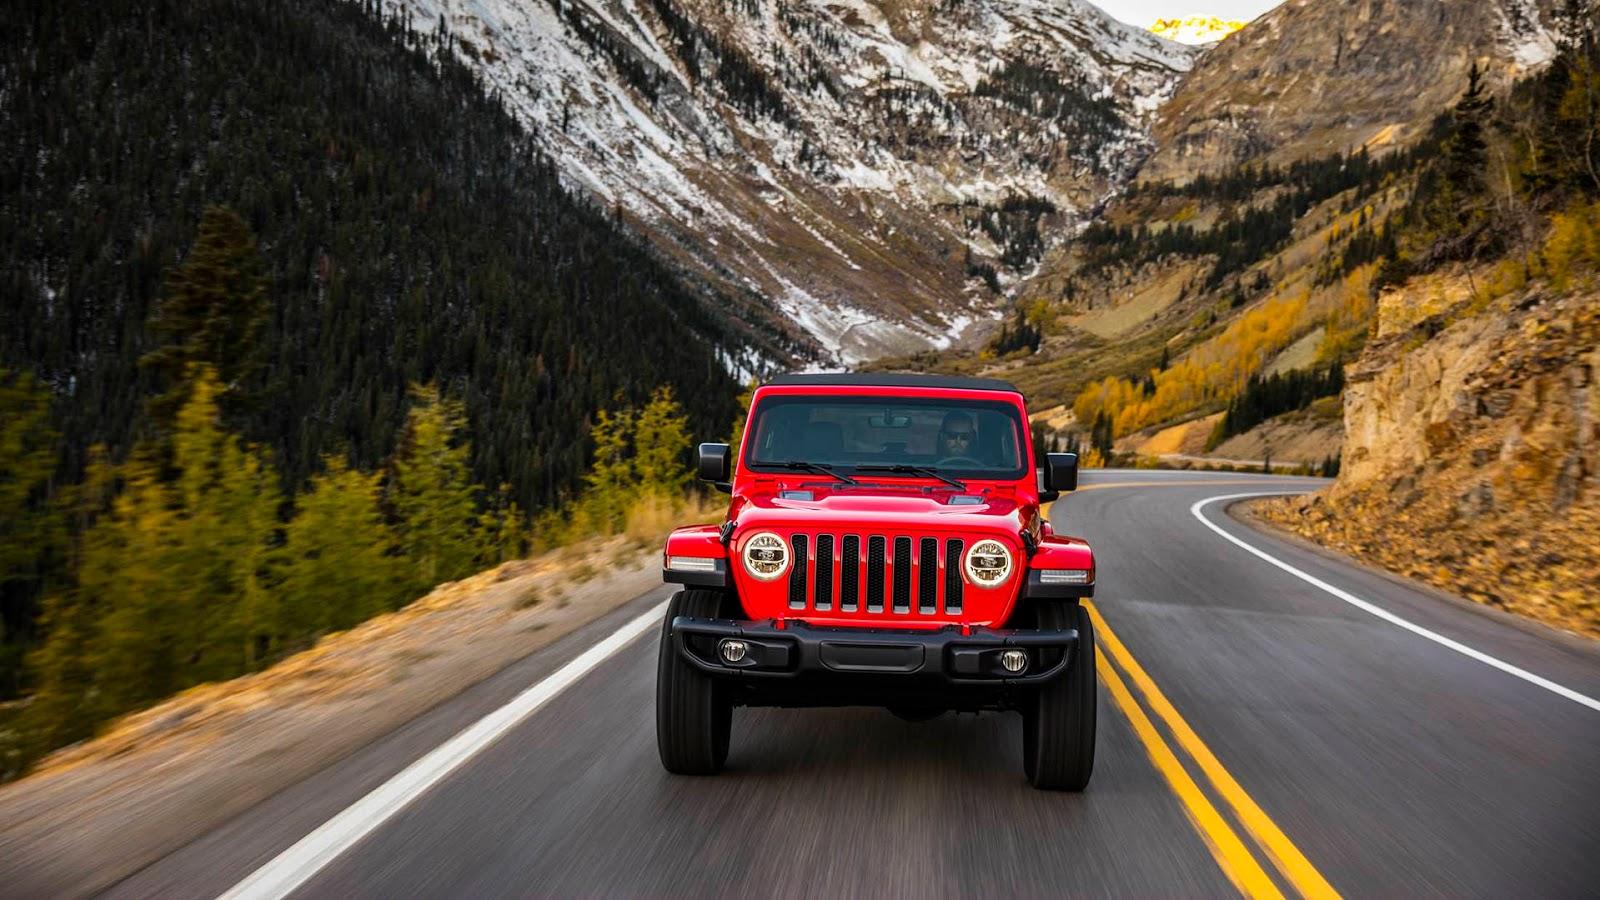 All-new 2018 Jeep® Wrangler Rubicon